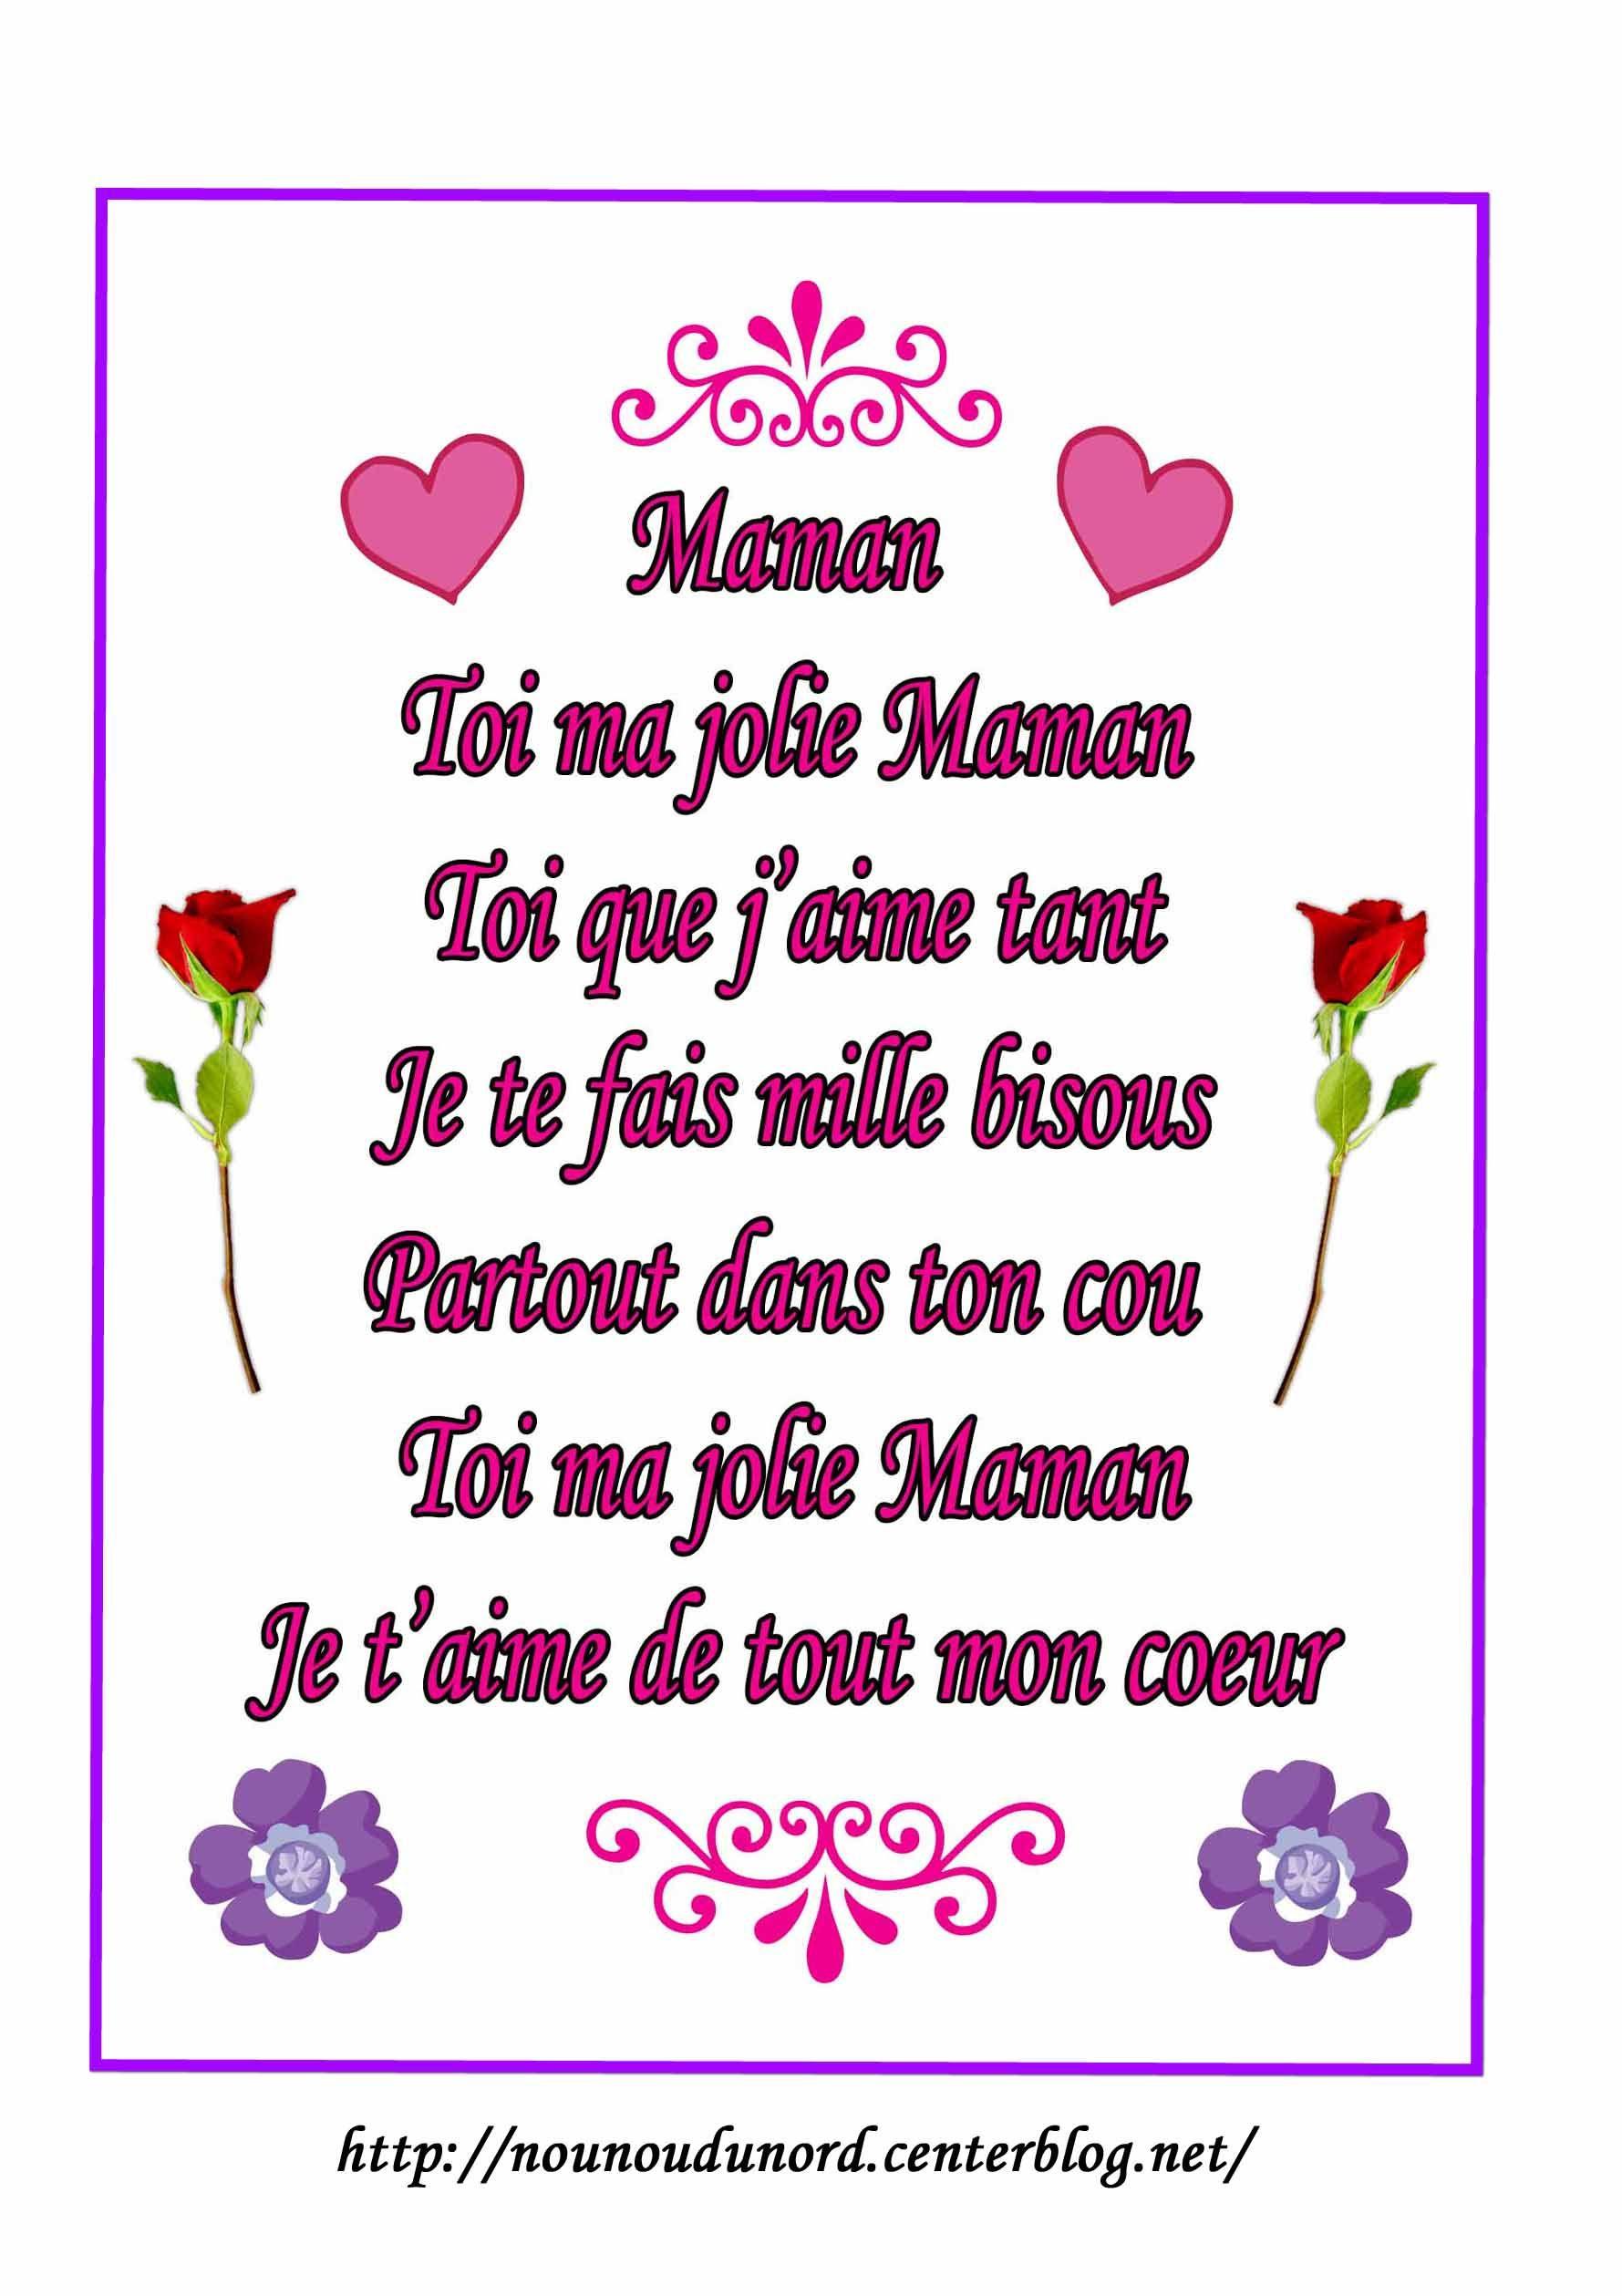 Joyeux Anniversaire Belle Maman : joyeux, anniversaire, belle, maman, Message, Anniversaire, Belle, Lillia